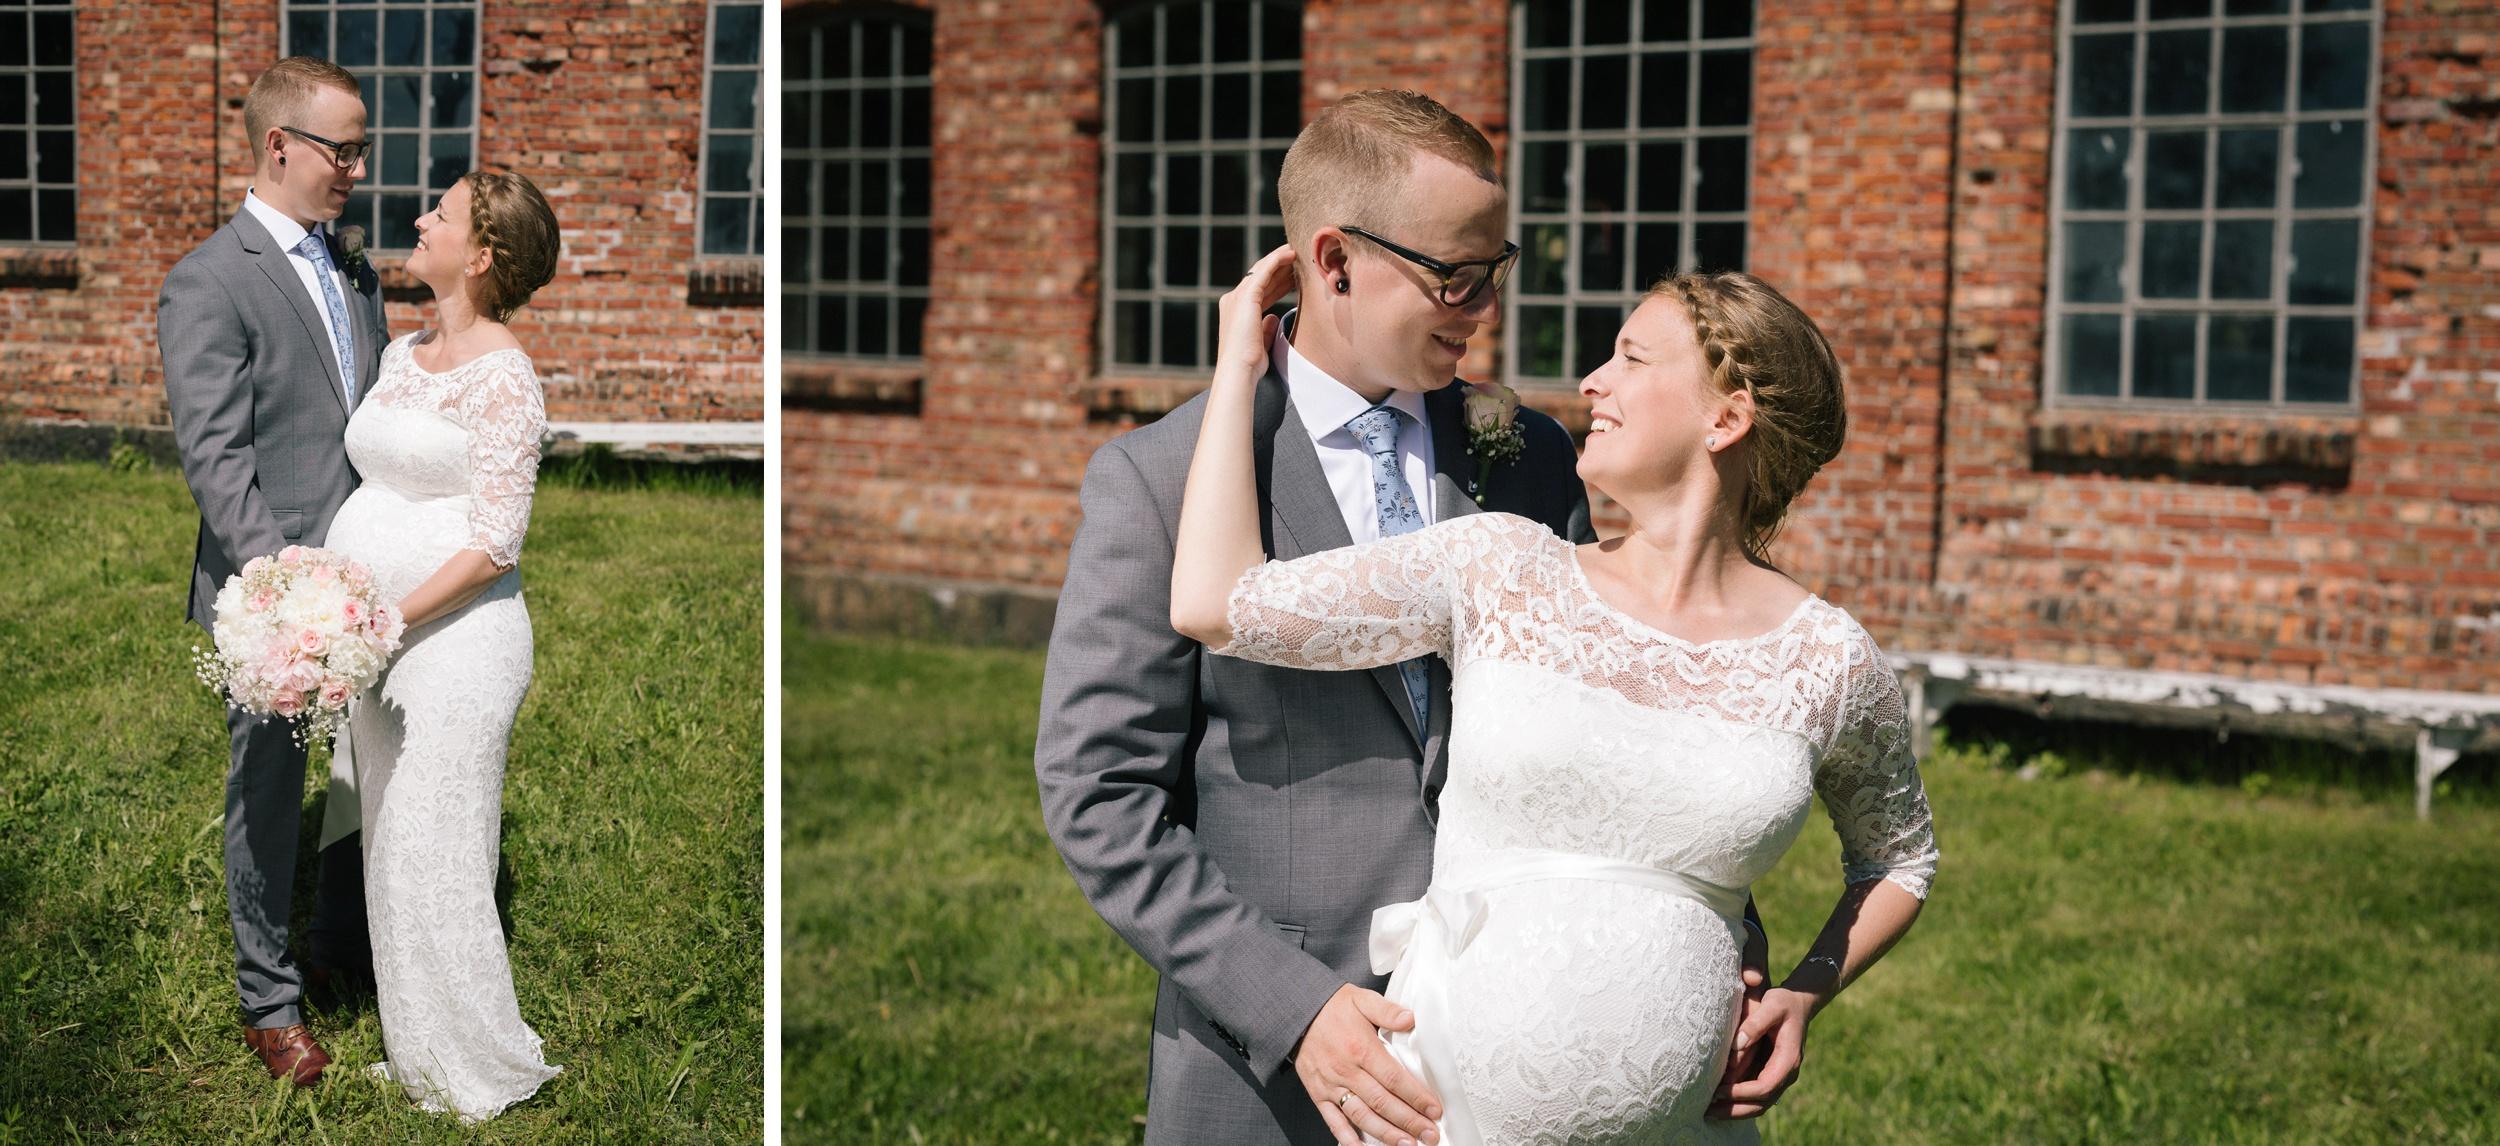 bryllup-bryllupsfotografering-bryllupsfotograf-sarpsborg-20170617-_H2A2432anneli_phillip_WEB.jpg